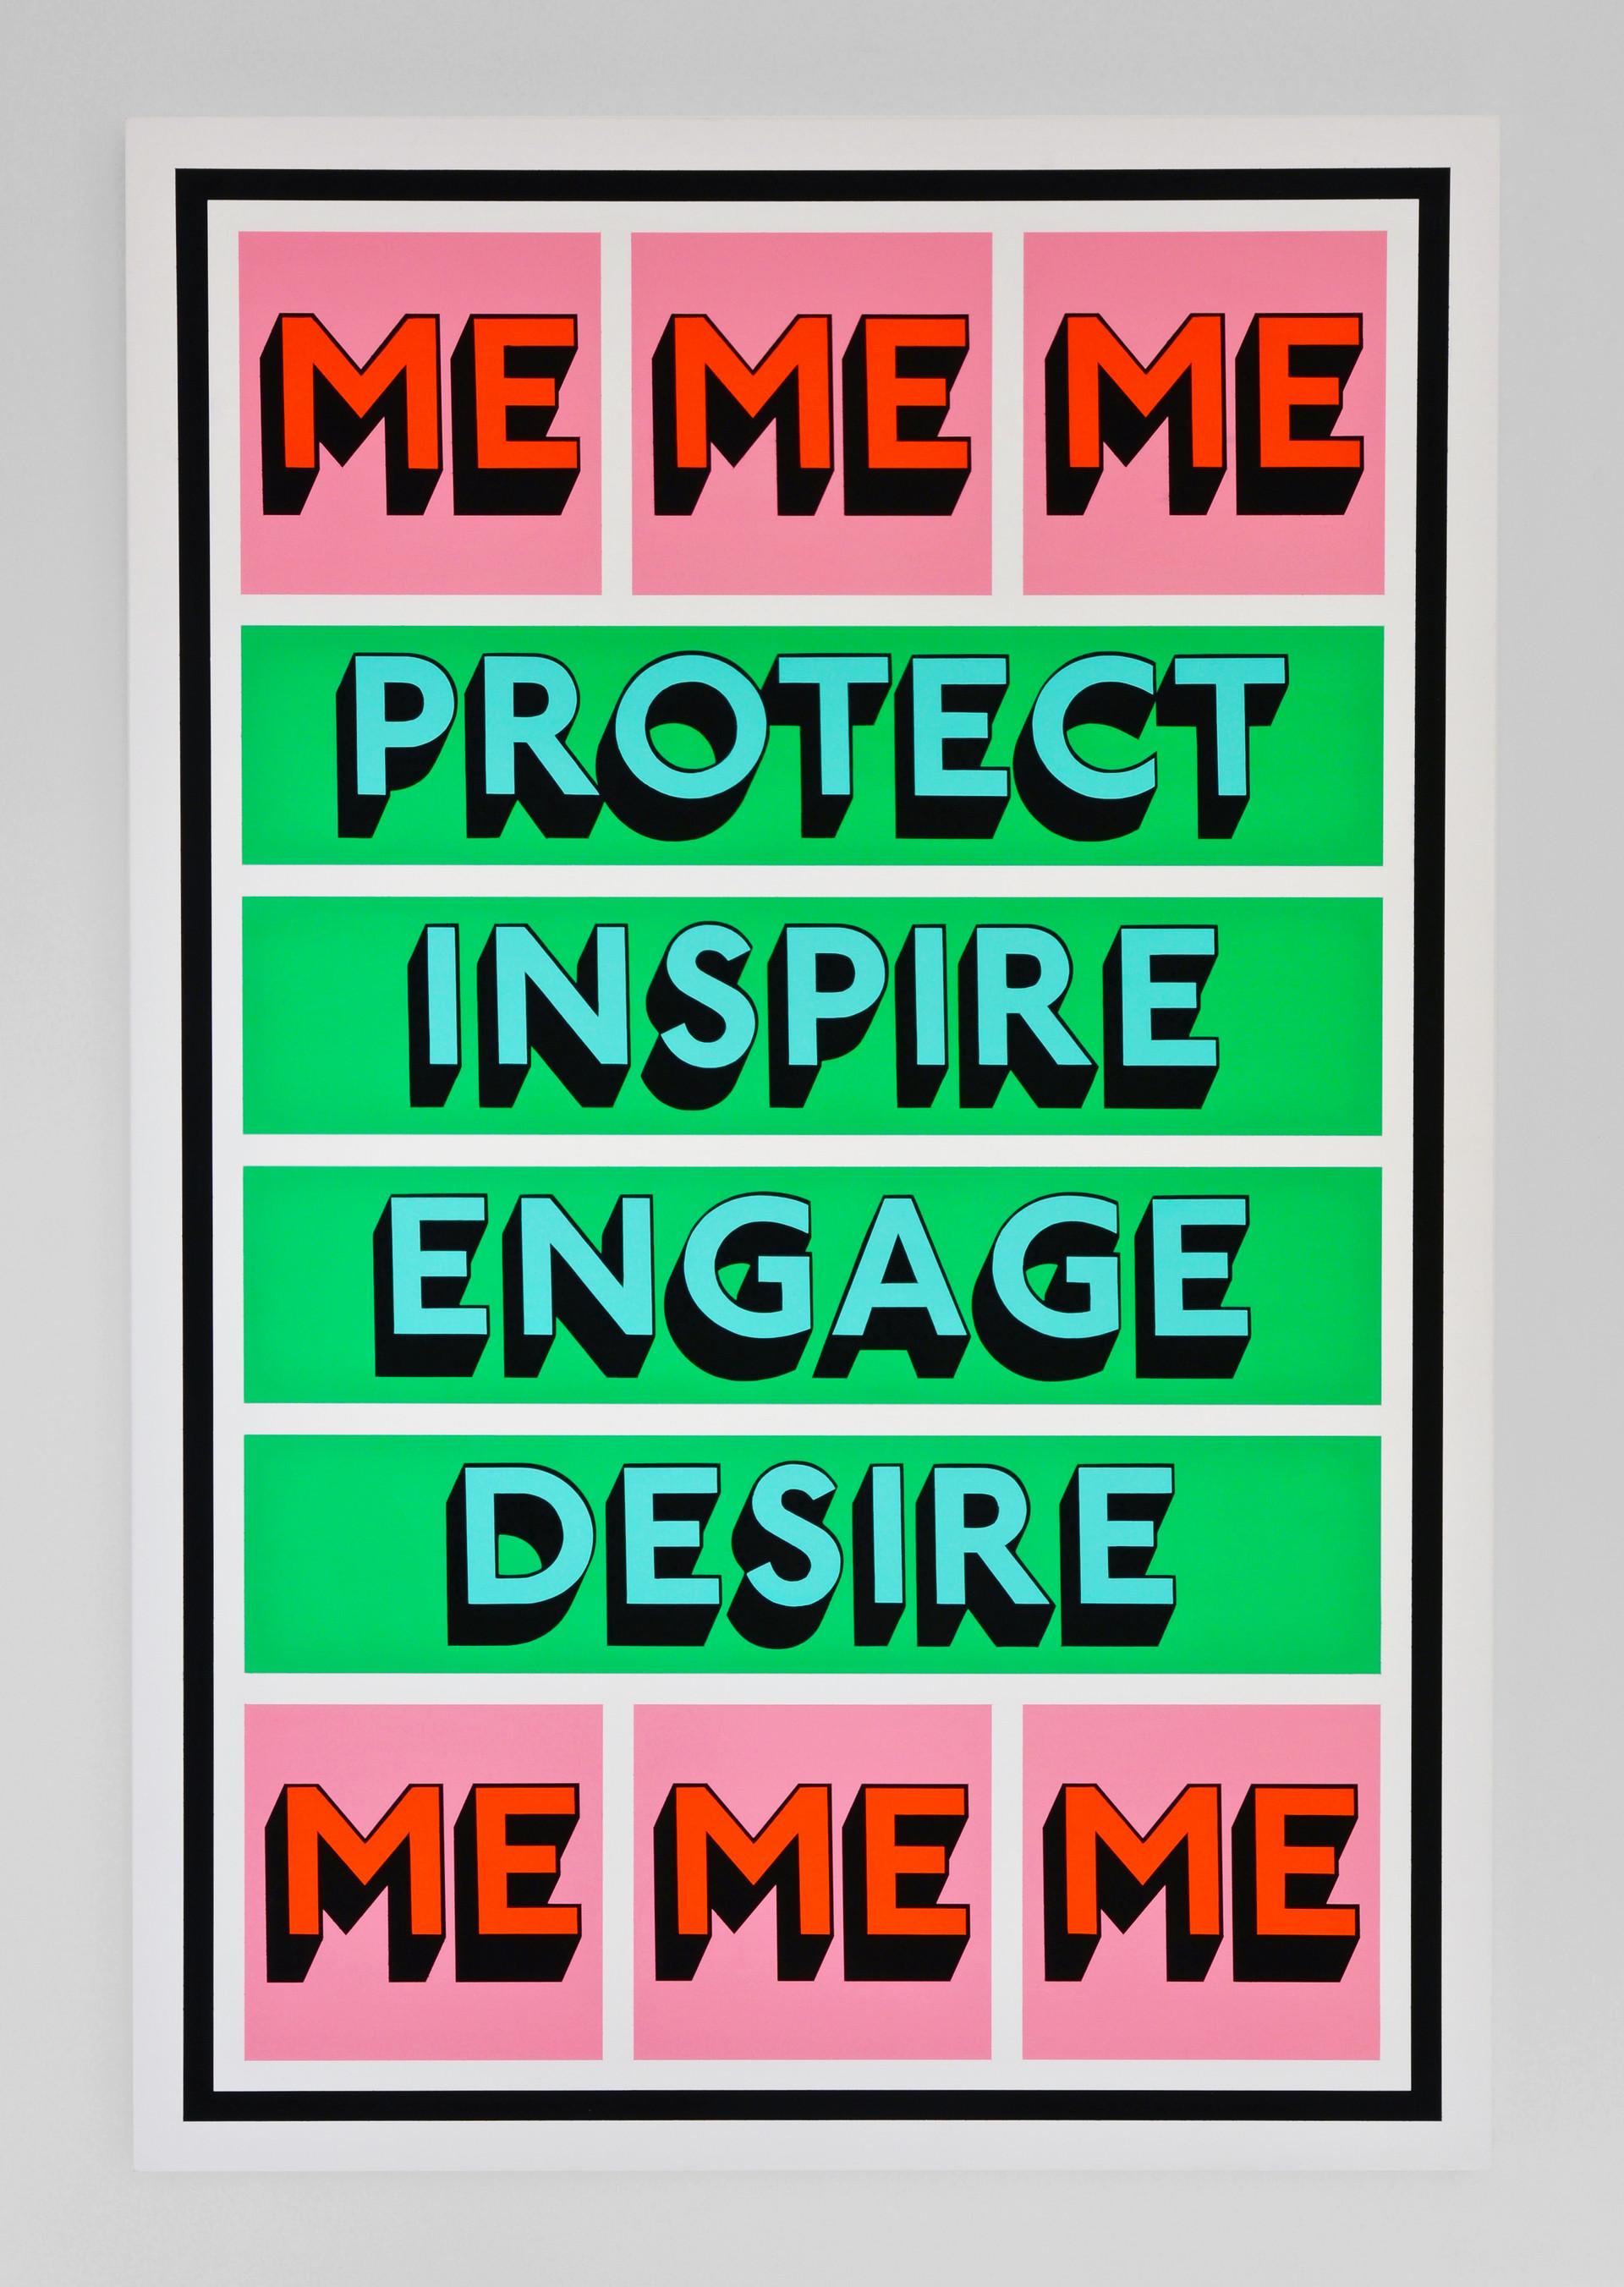 PROTECT_ME.jpg